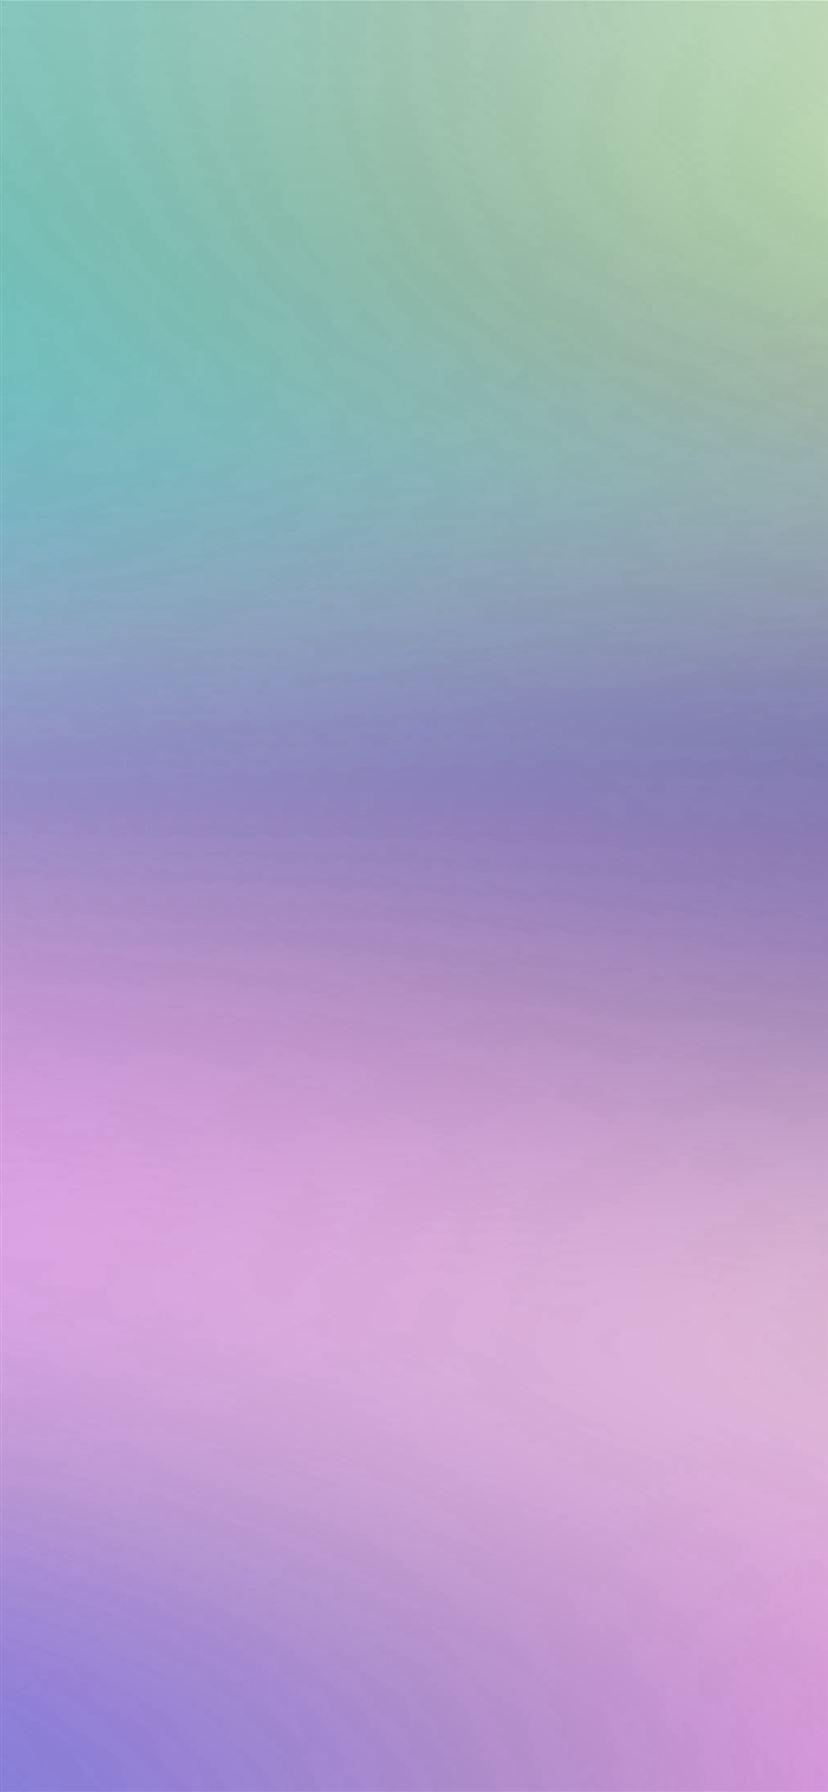 Blue And Purple Blur Gradation Background iPhone 11